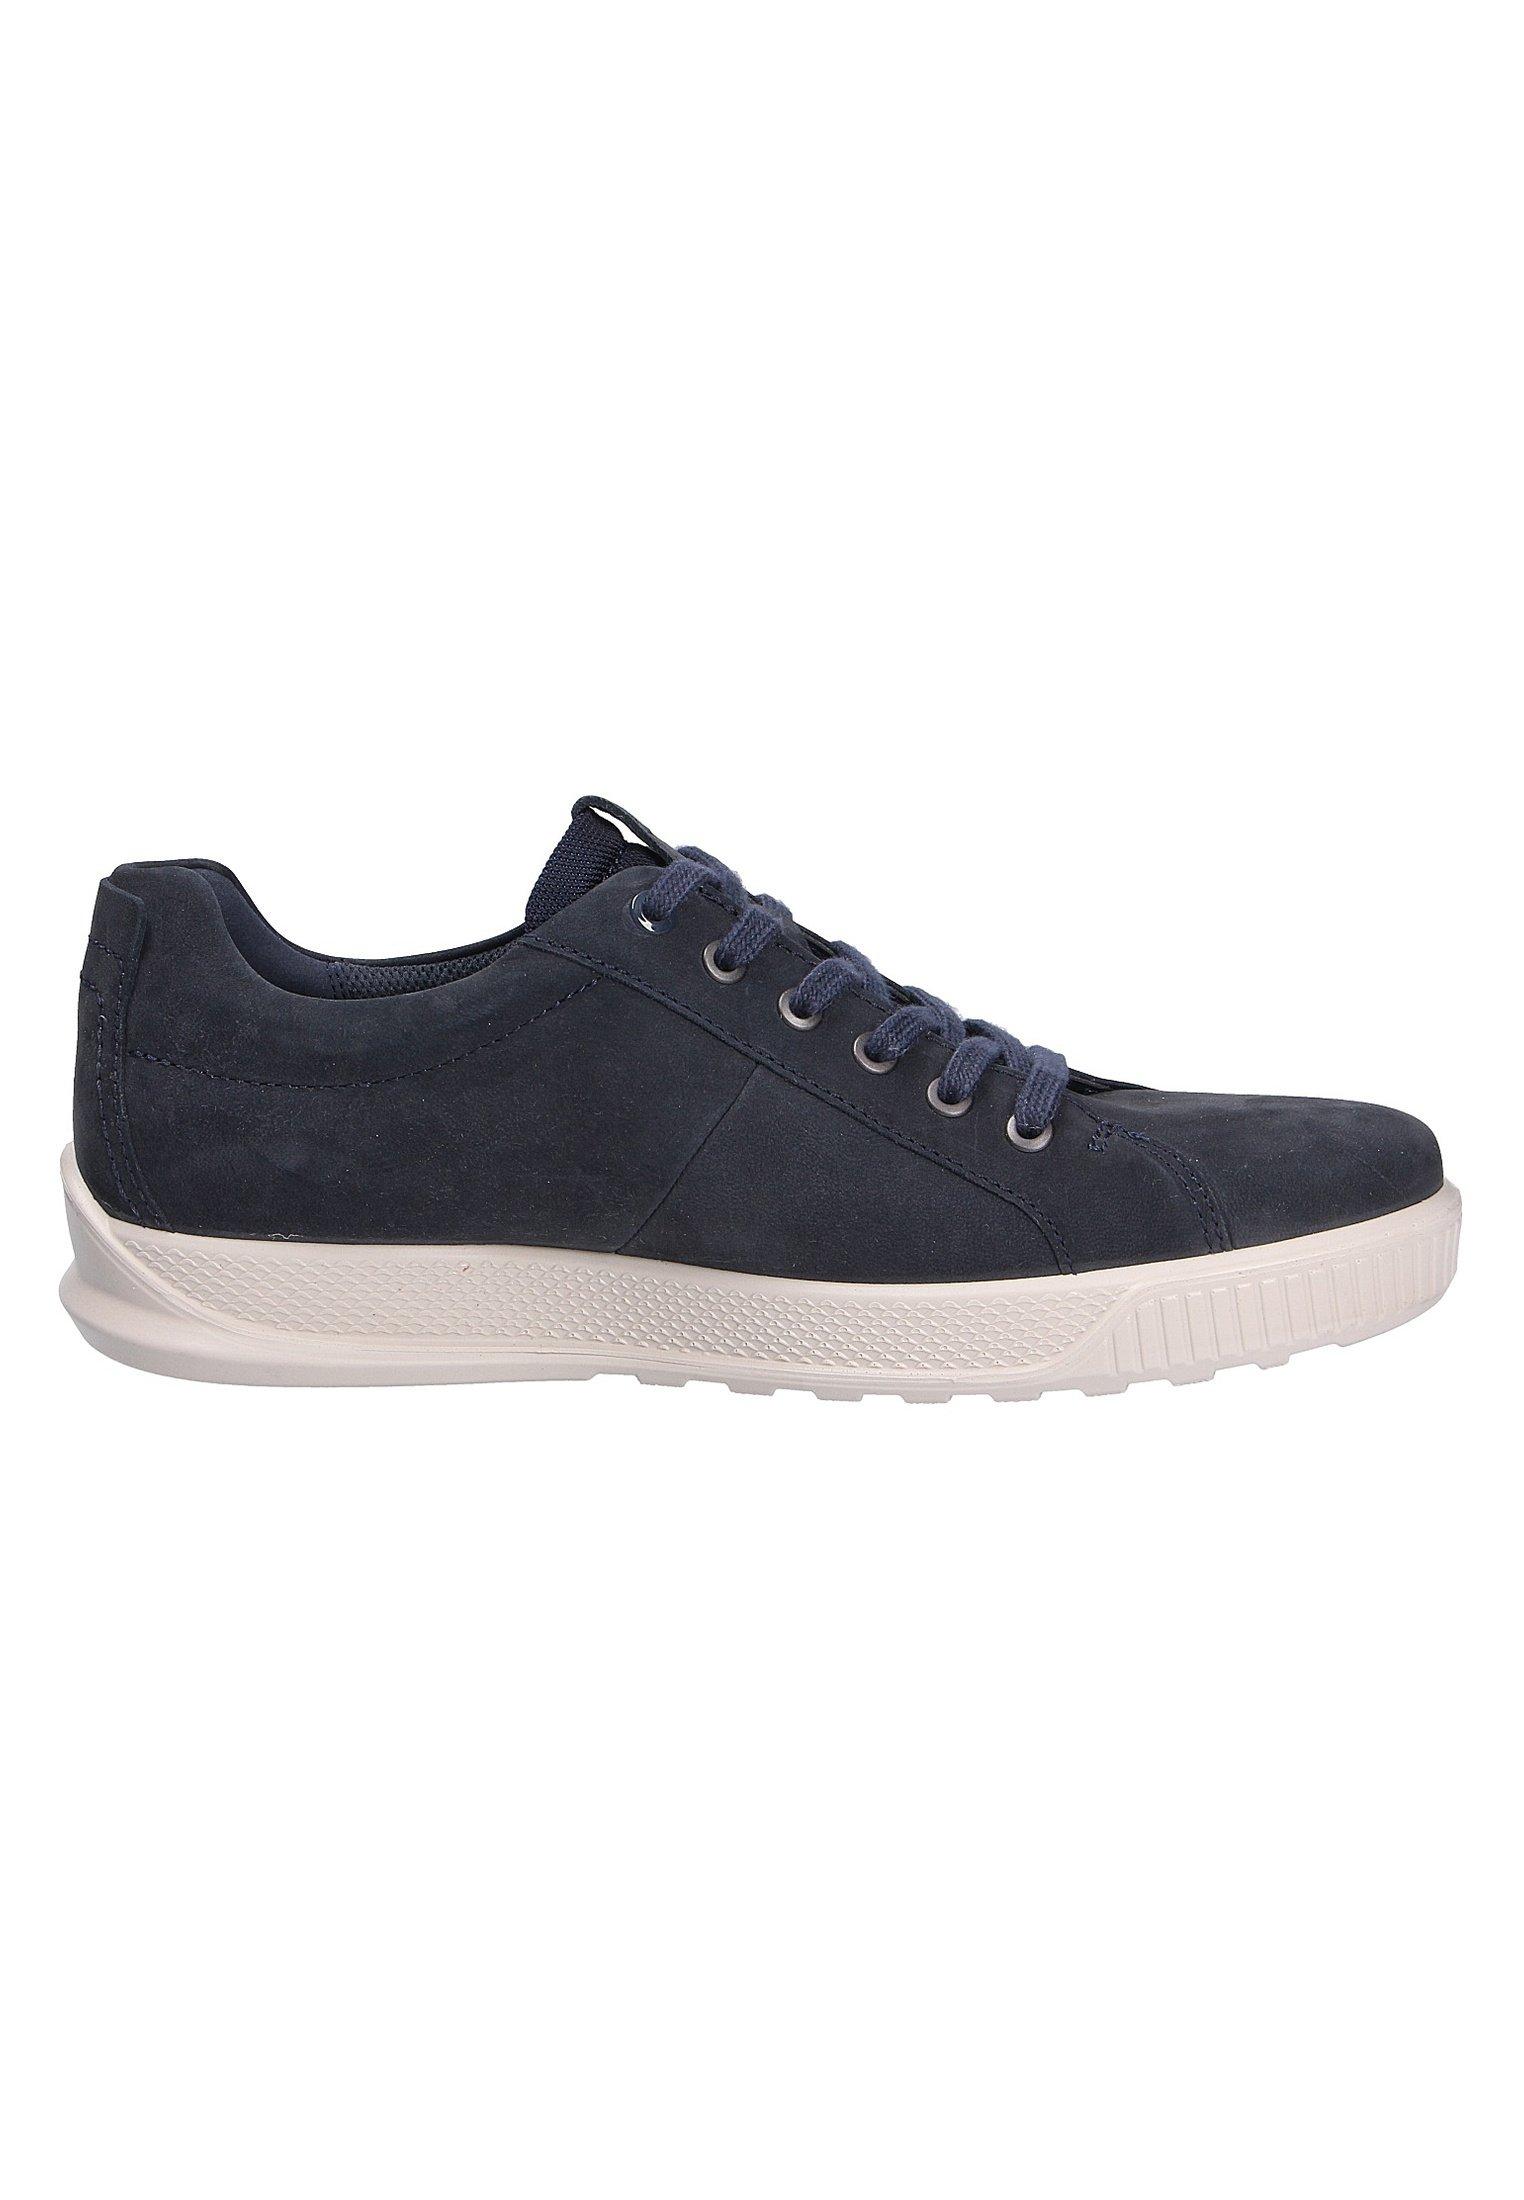 Homme BYWAY - Chaussures à lacets